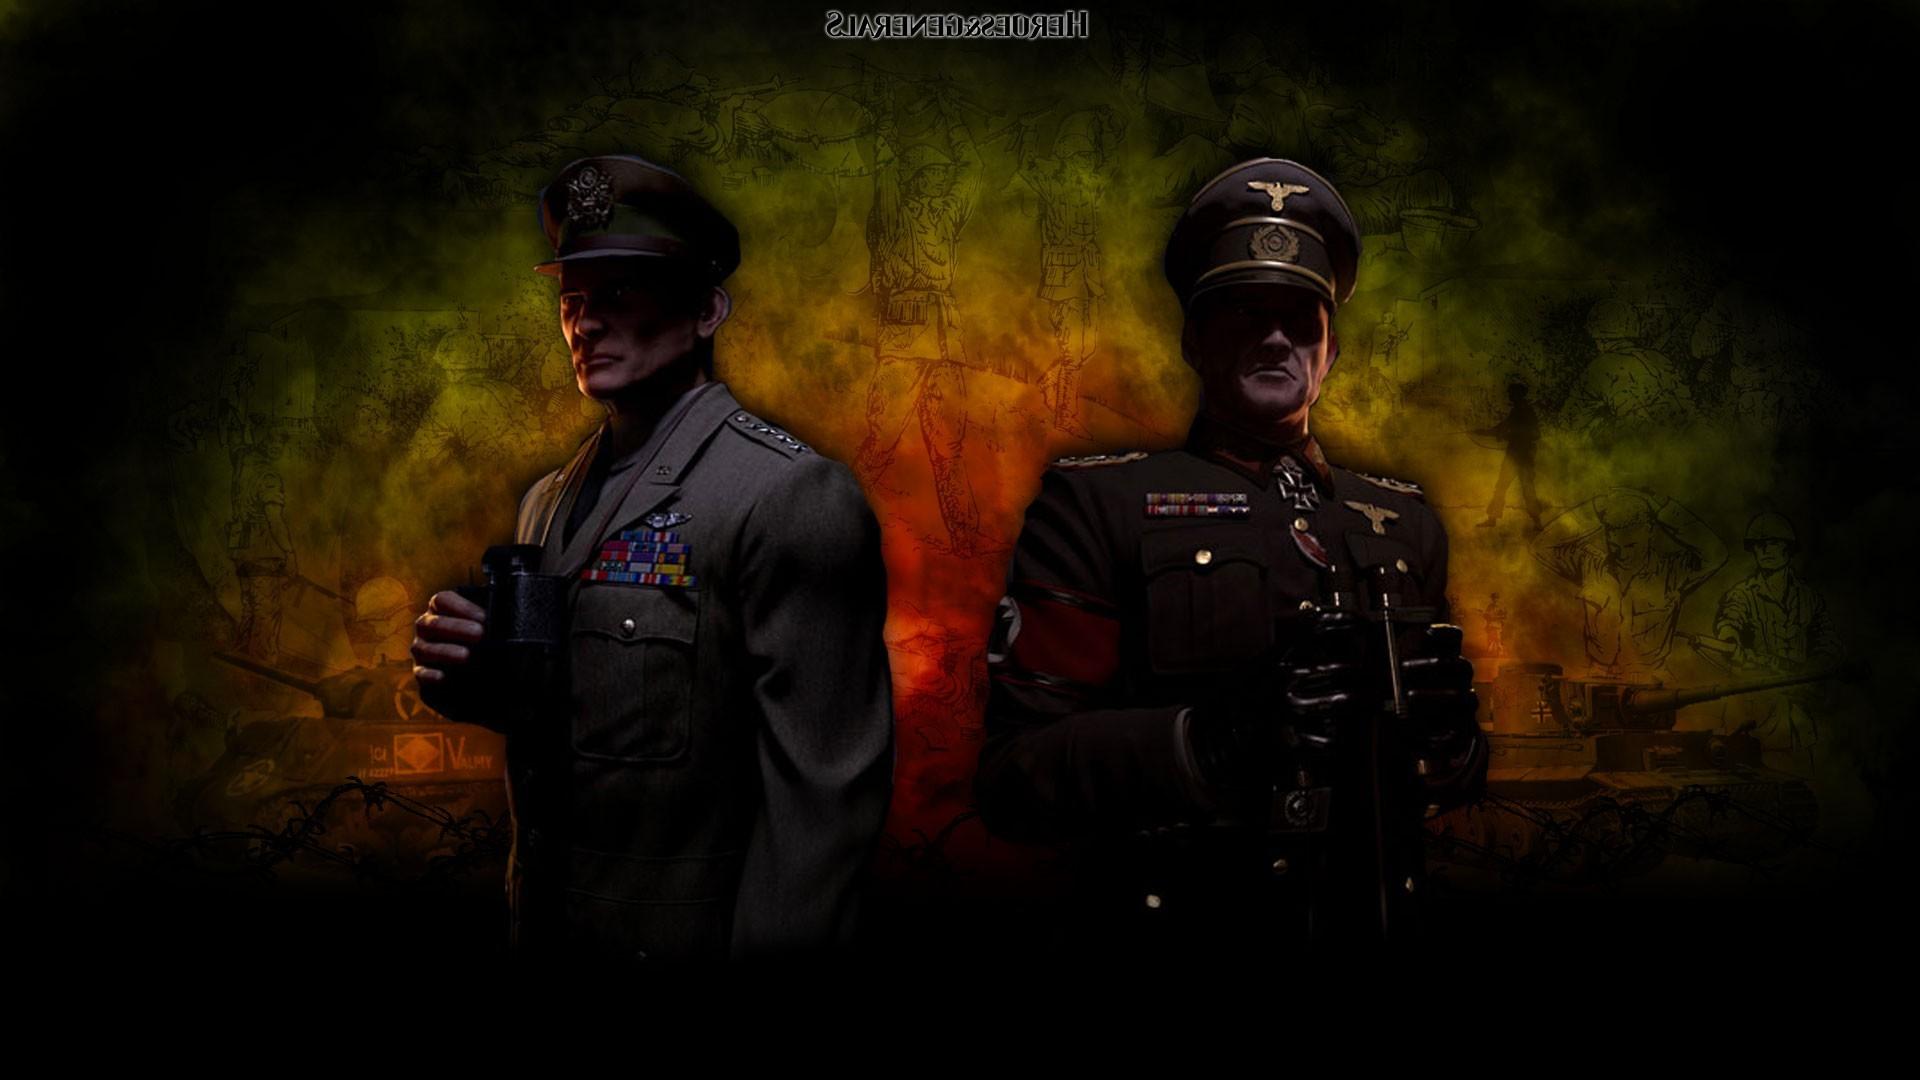 video Games, Heroes & Generals Wallpapers HD / Desktop and Mobile  Backgrounds